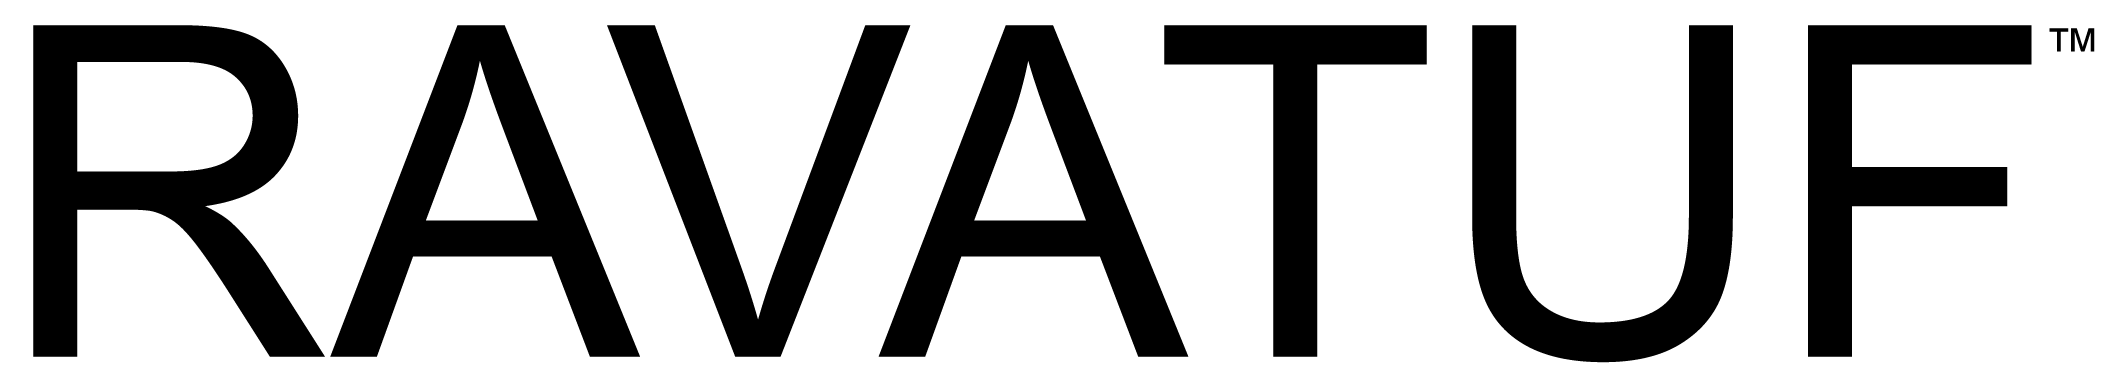 RAVATUF™ Logo